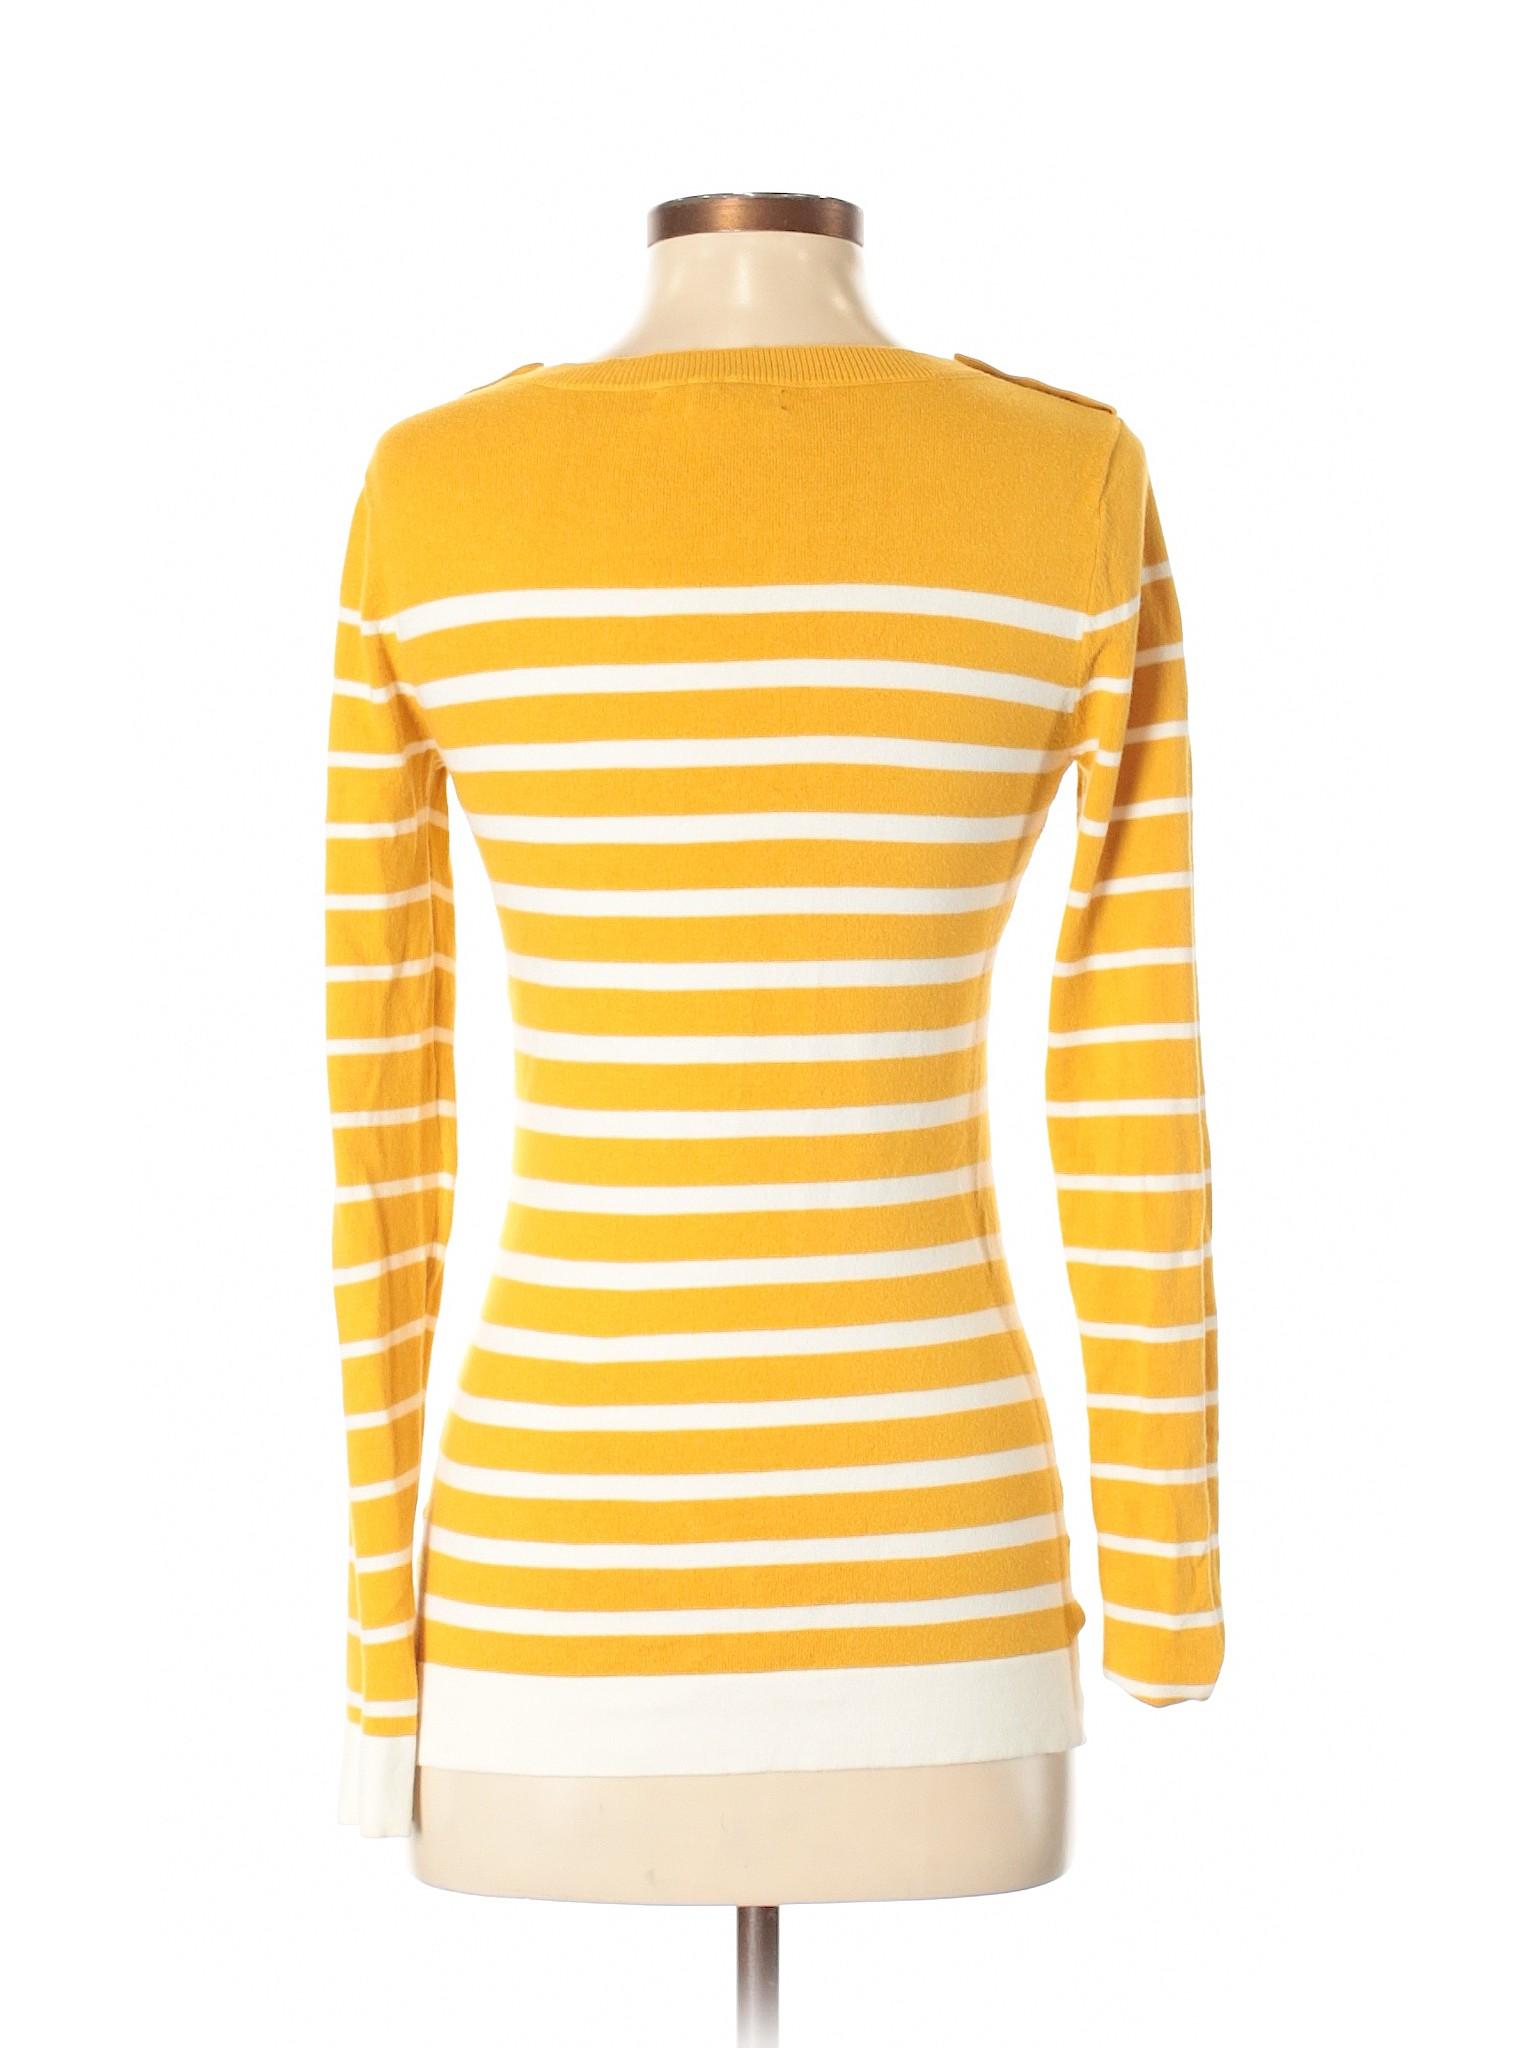 Banana Boutique winter Pullover Sweater Republic Bv57wv